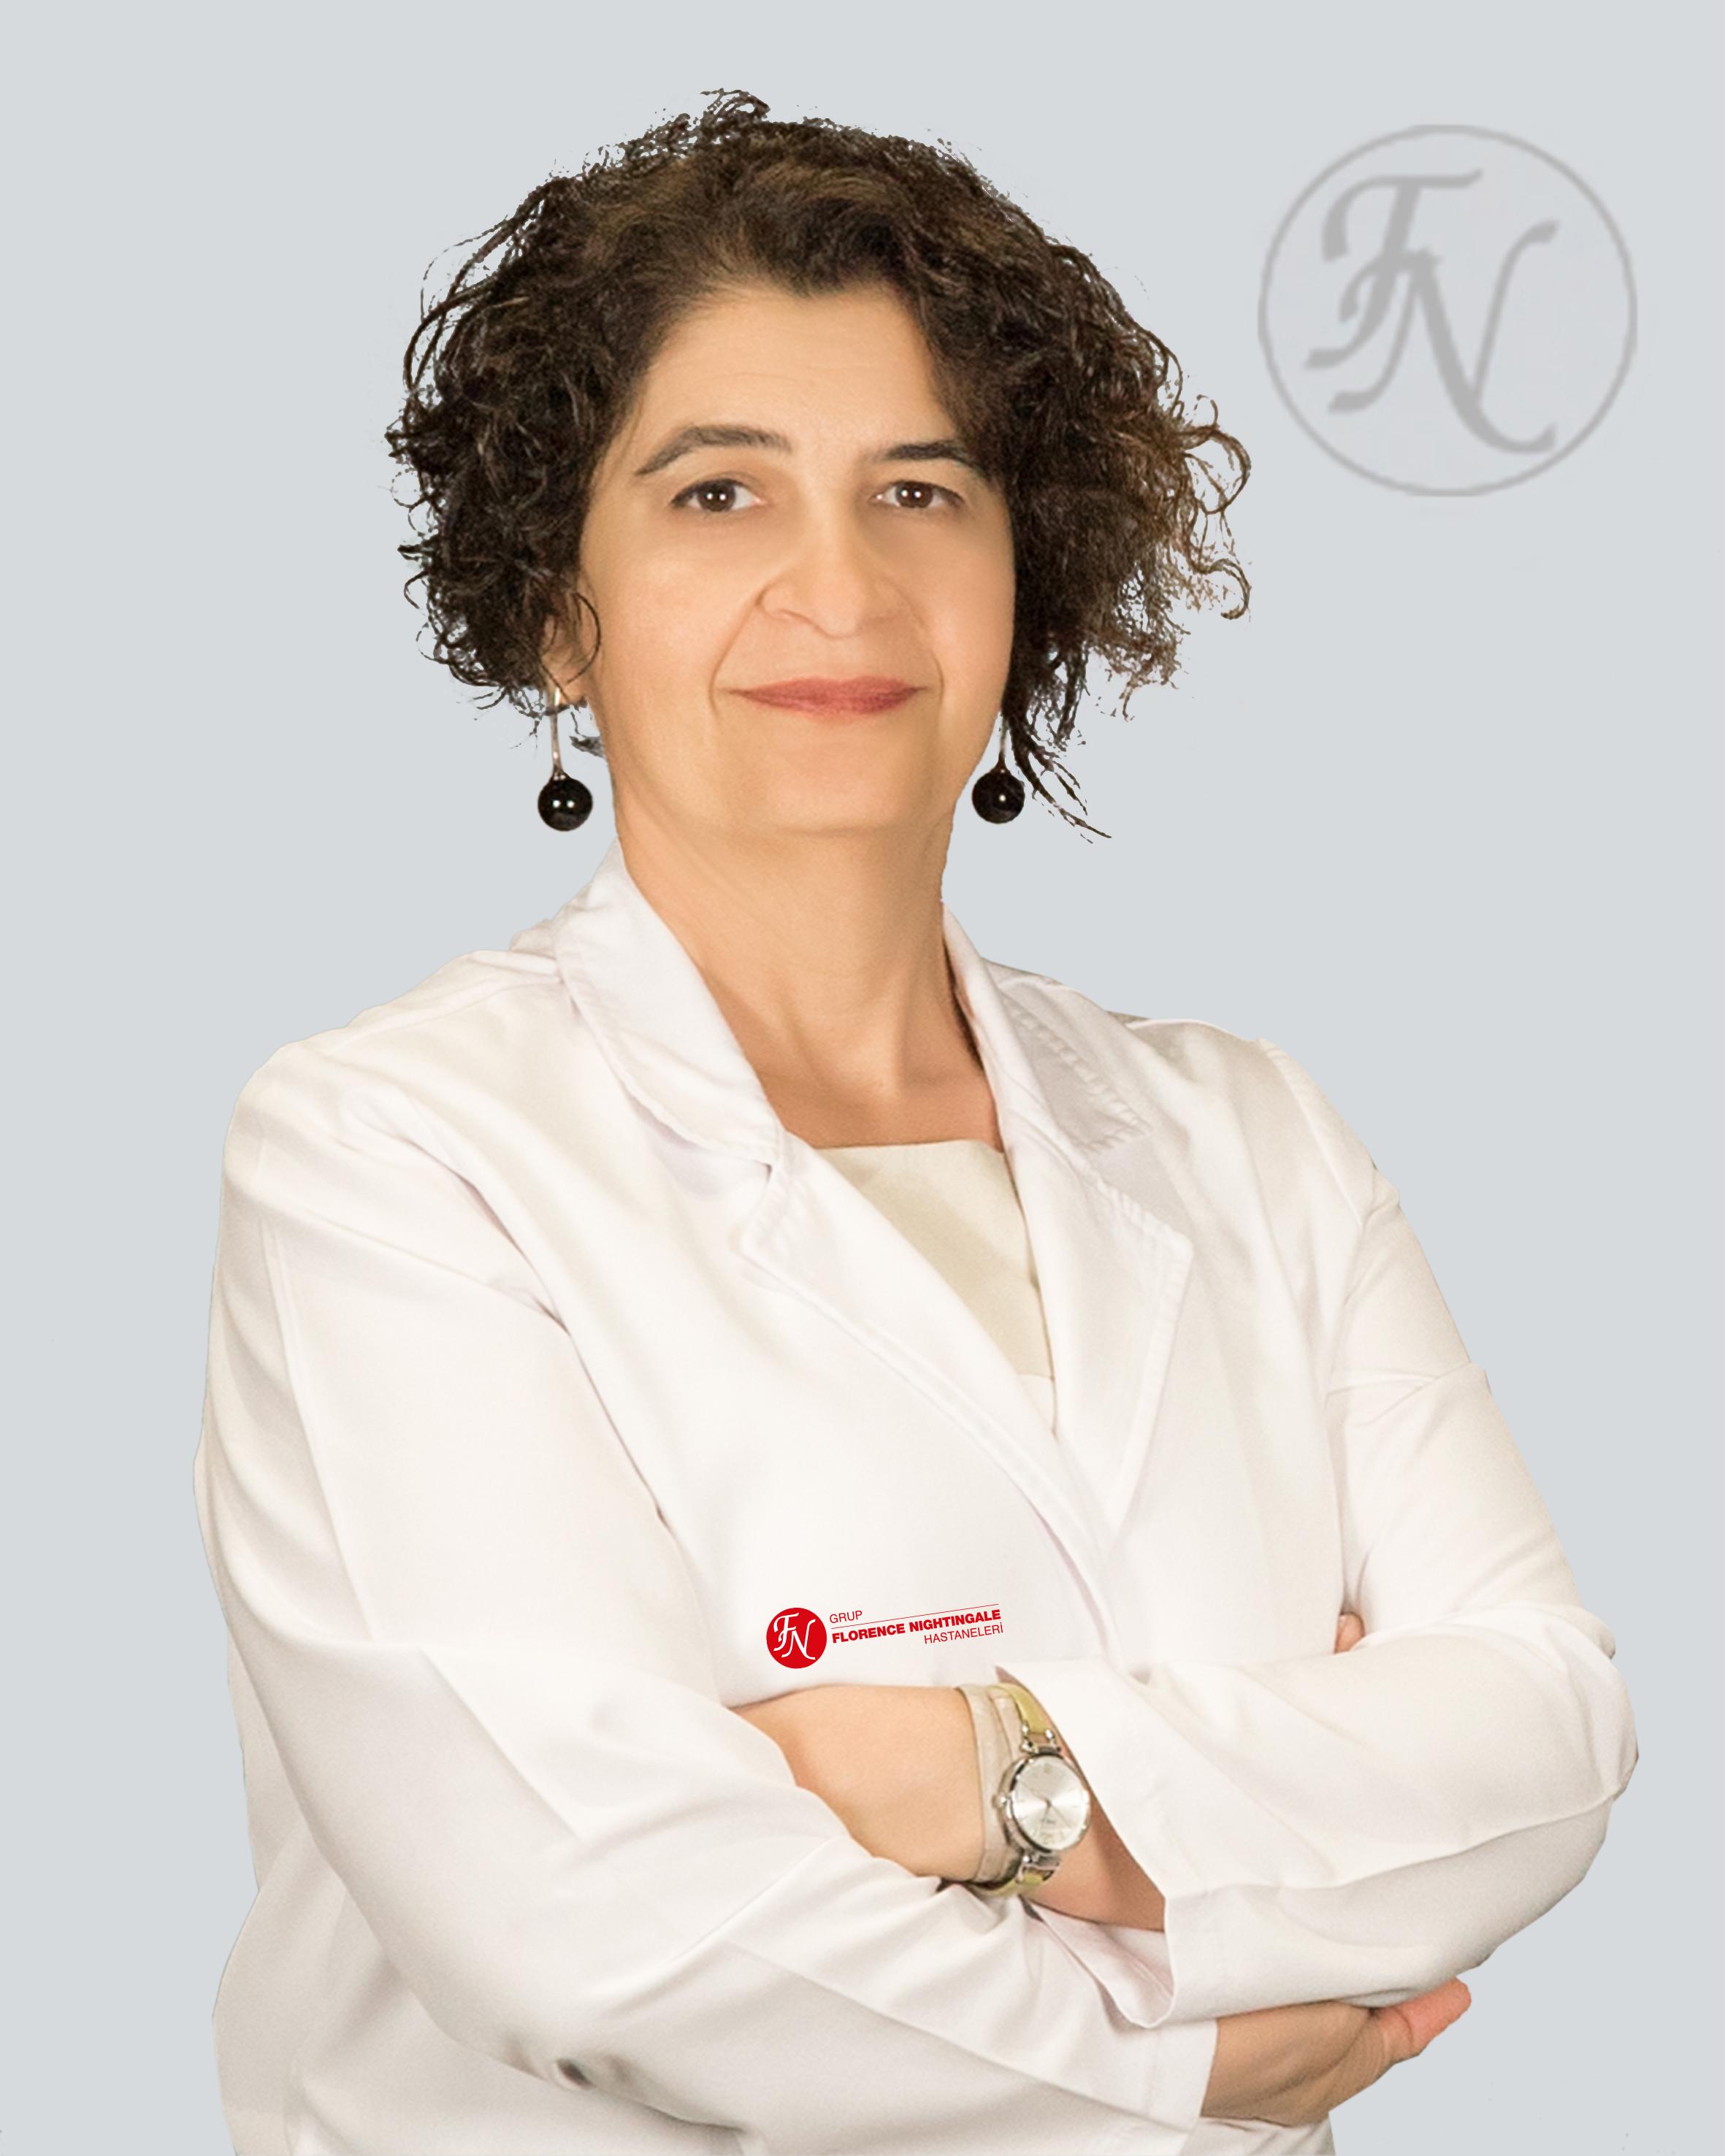 prof-dr-dilek-necioglu-orken